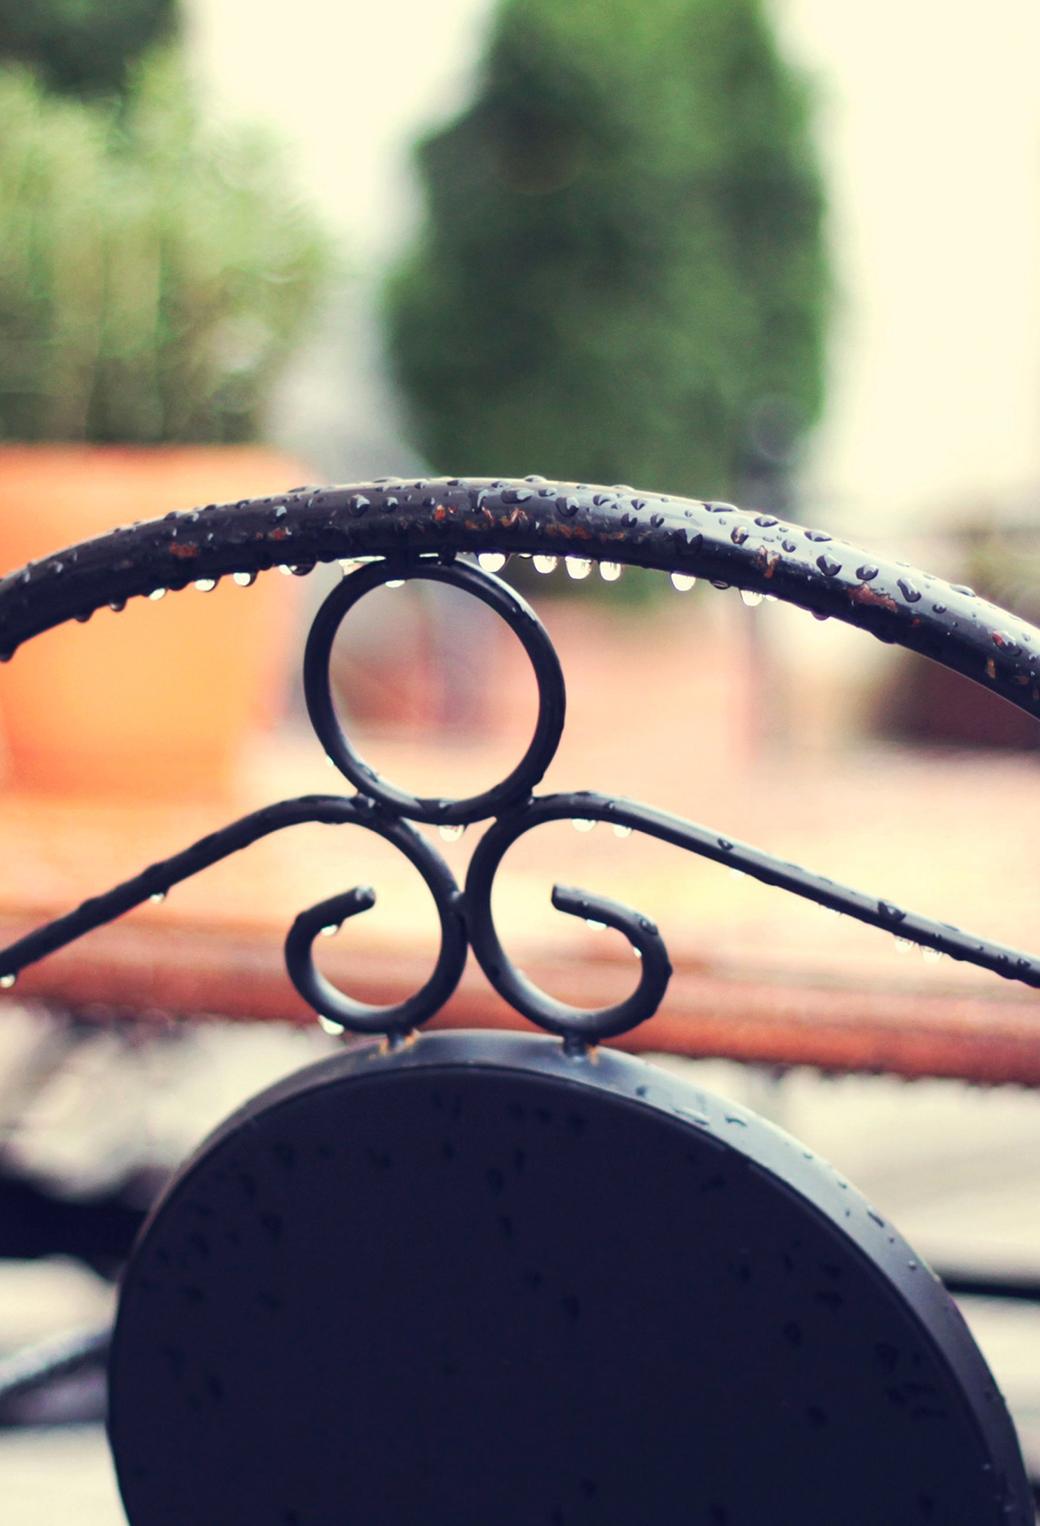 Wet Chair Rain 3Wallpapers iPhone Parallax Wet Chair Rain